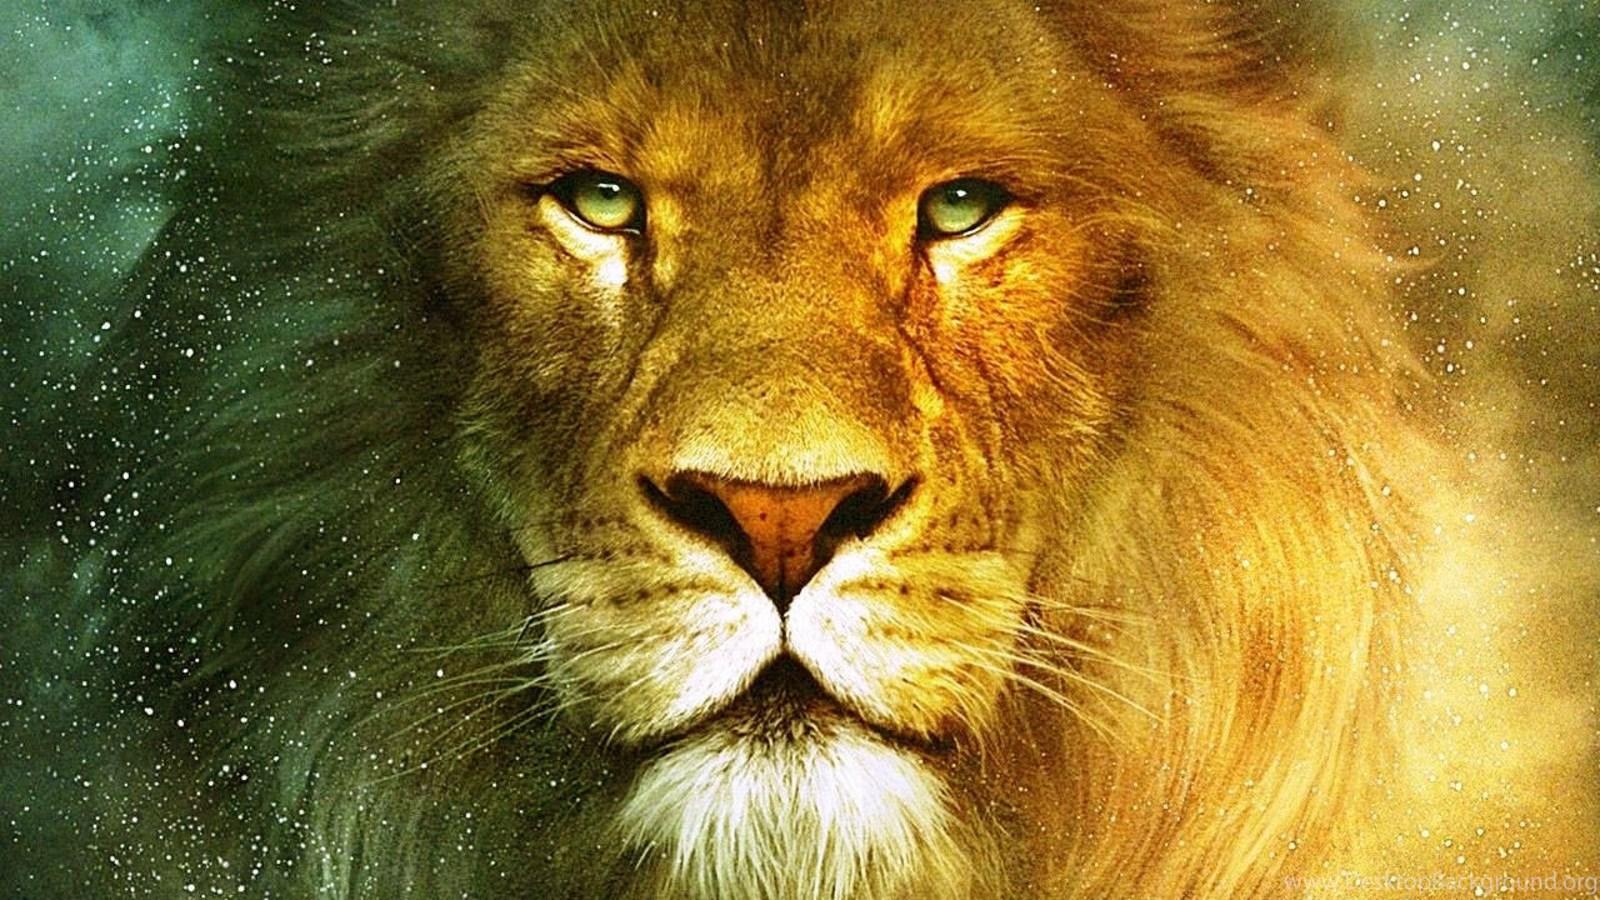 Lion wallpapers desktop background - Lion wallpaper ...